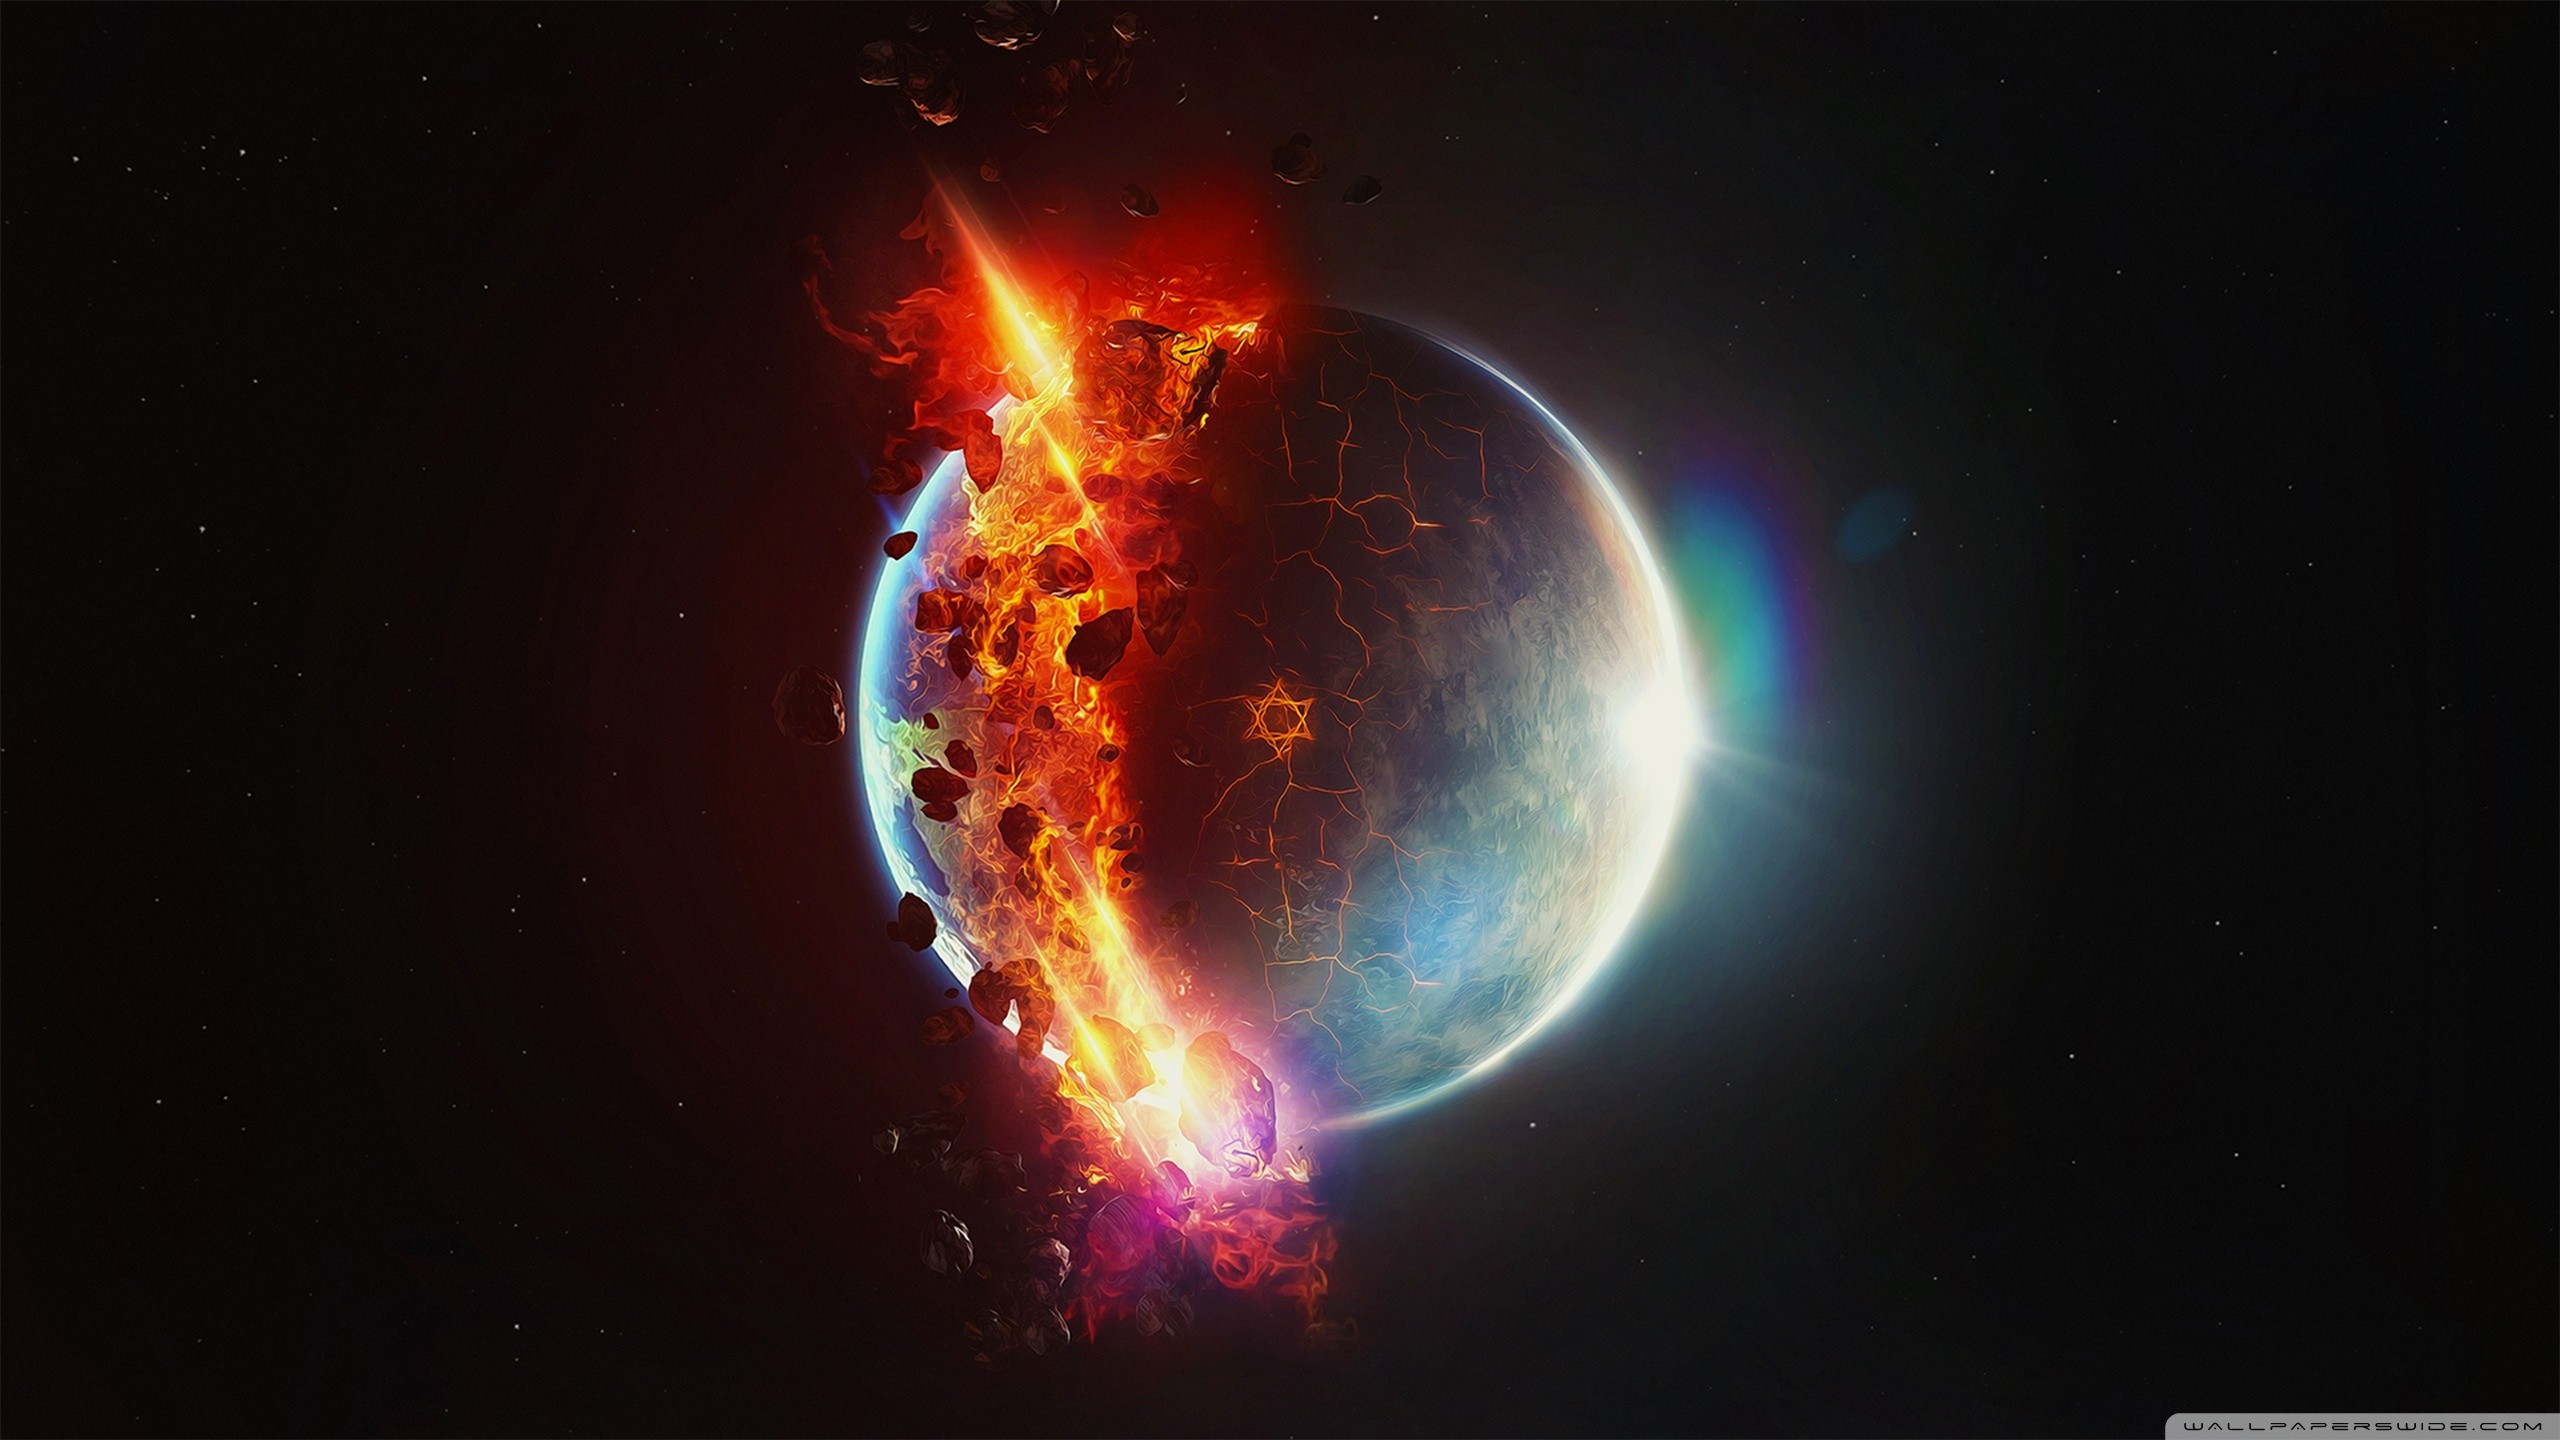 Res: 2560x1440, planet explosion Wallpaper 4 - 2560 X 1440